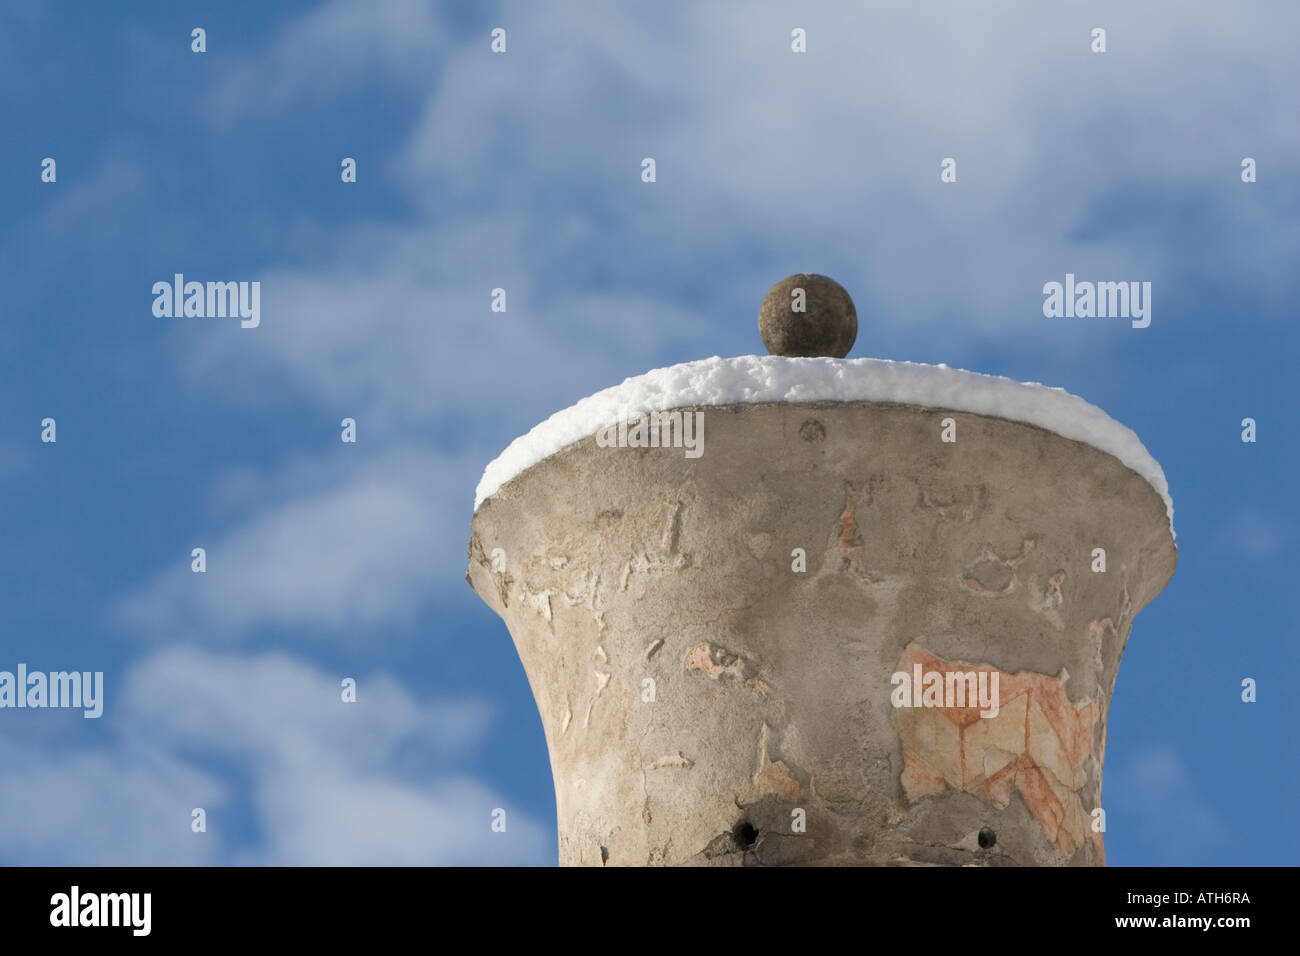 Chimney of the Rennaissance Castle Goldrain, Italy Stock Photo